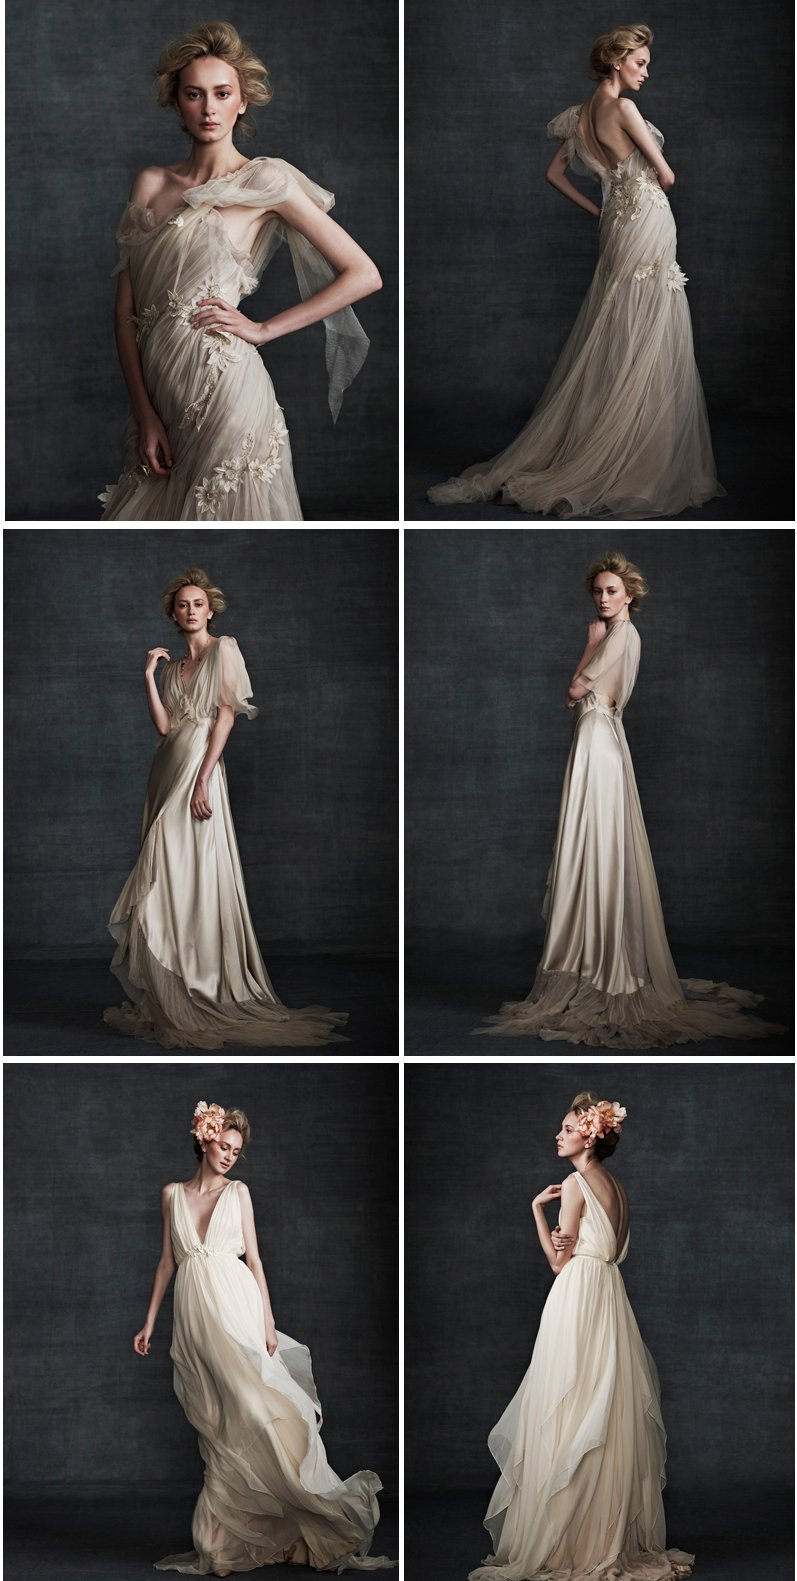 Elegant-wedding-gowns-samuele-couture-2013-wedding-dress-2.full